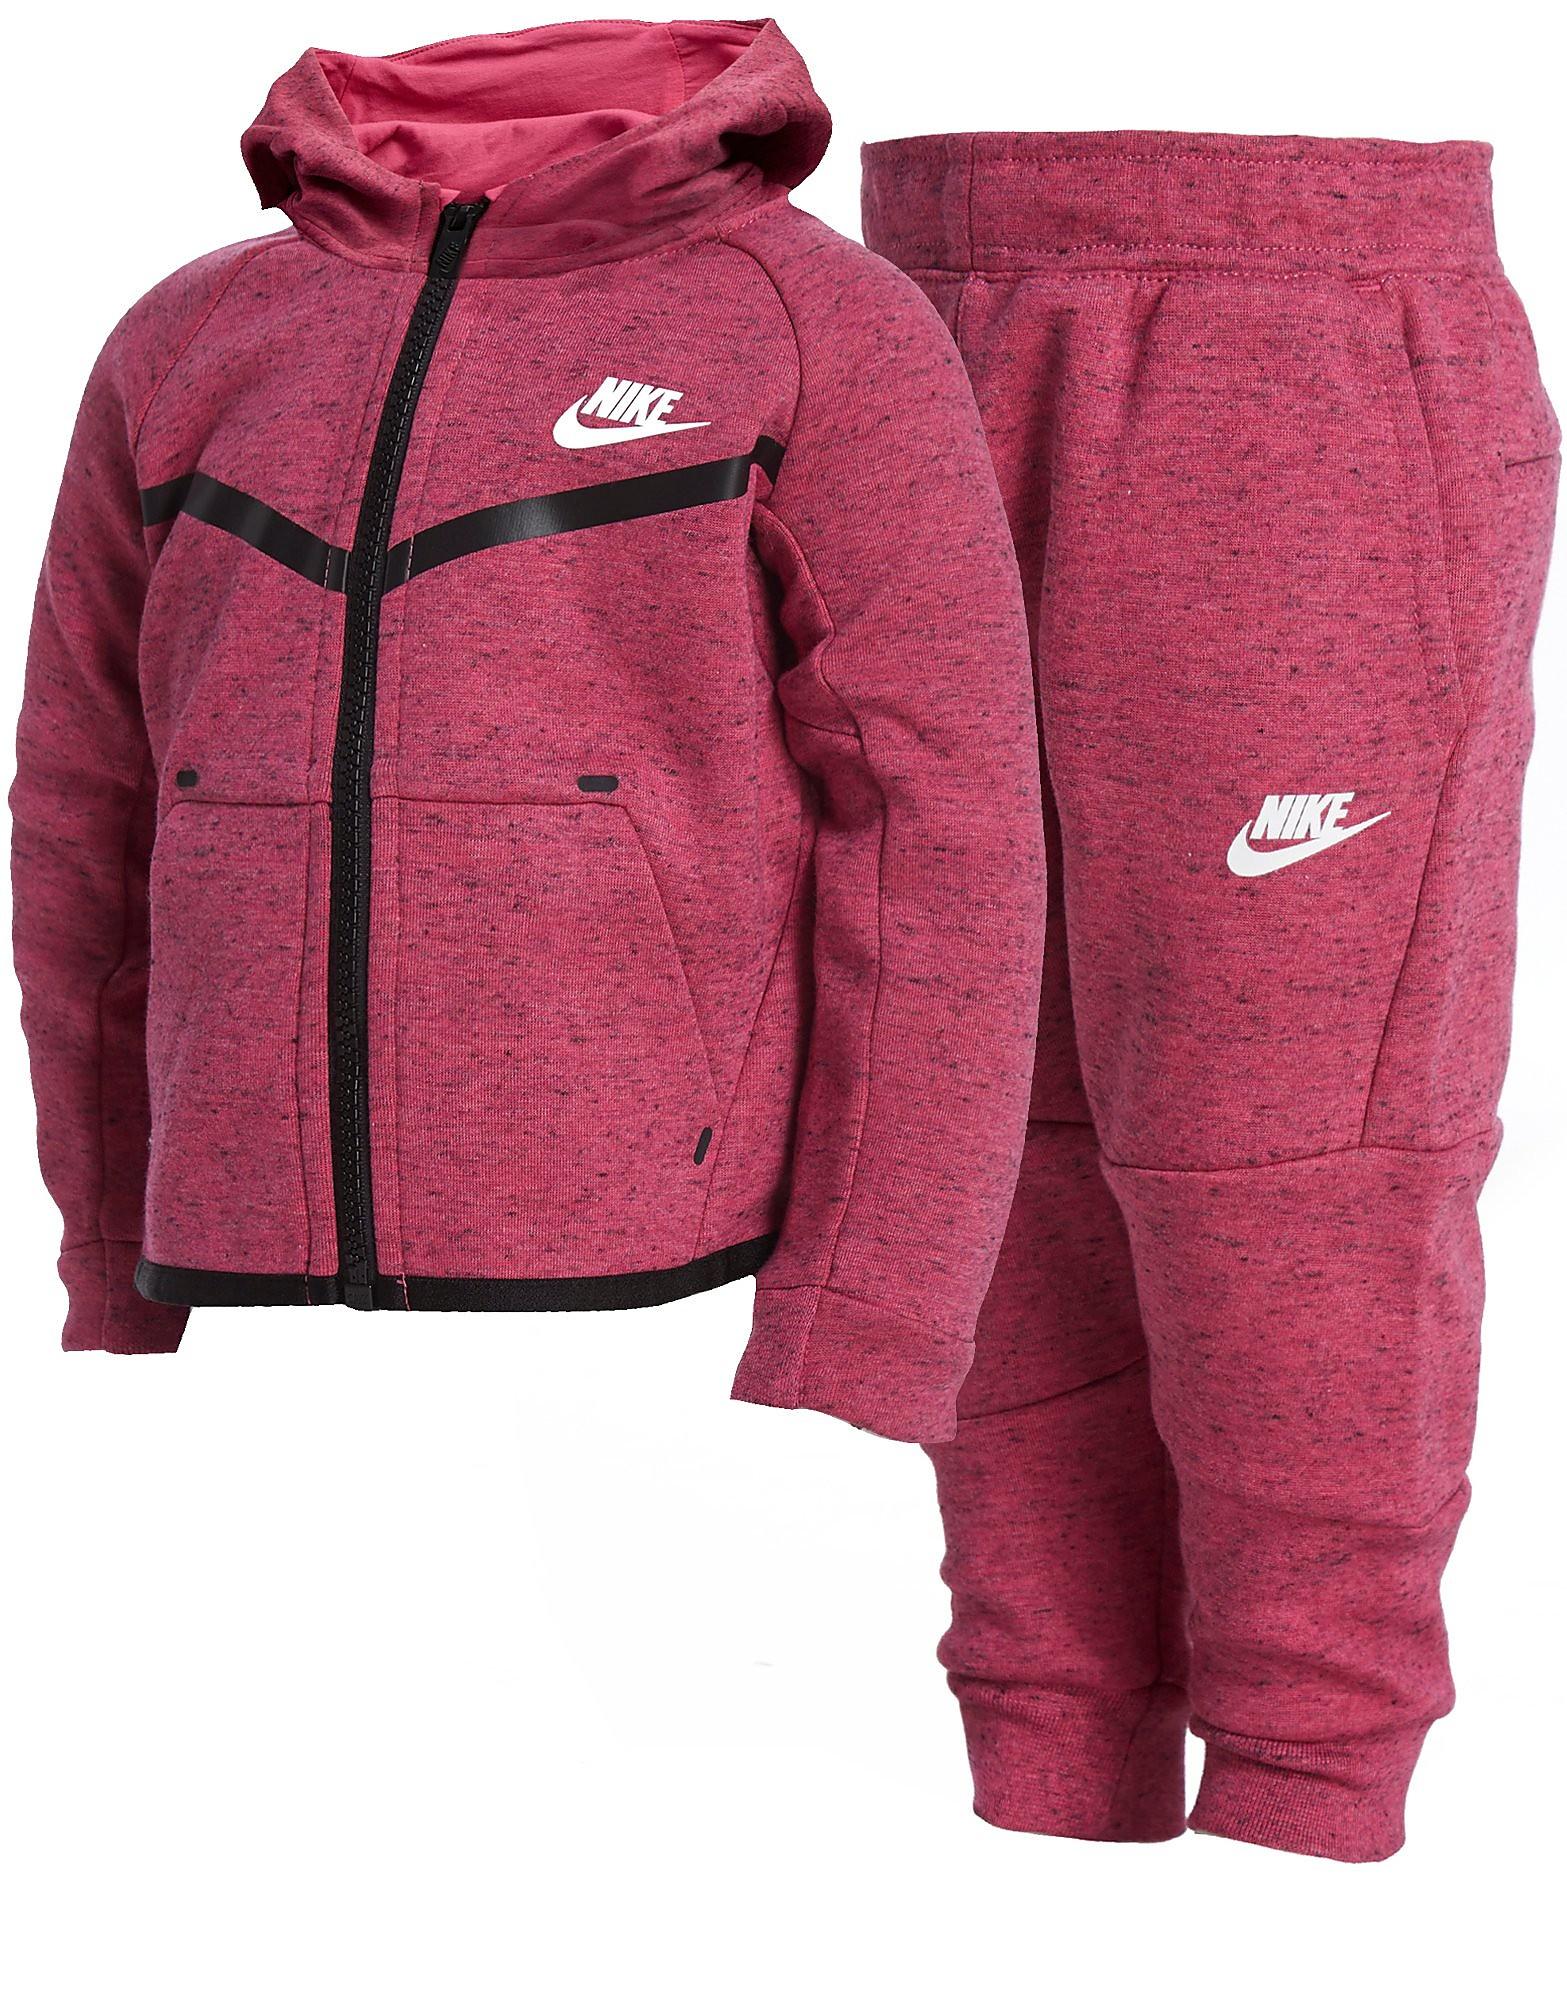 Nike Girls  Tech Fleece Suit Infant - Pink White - Kids - Sports ... c73d7a1d4733